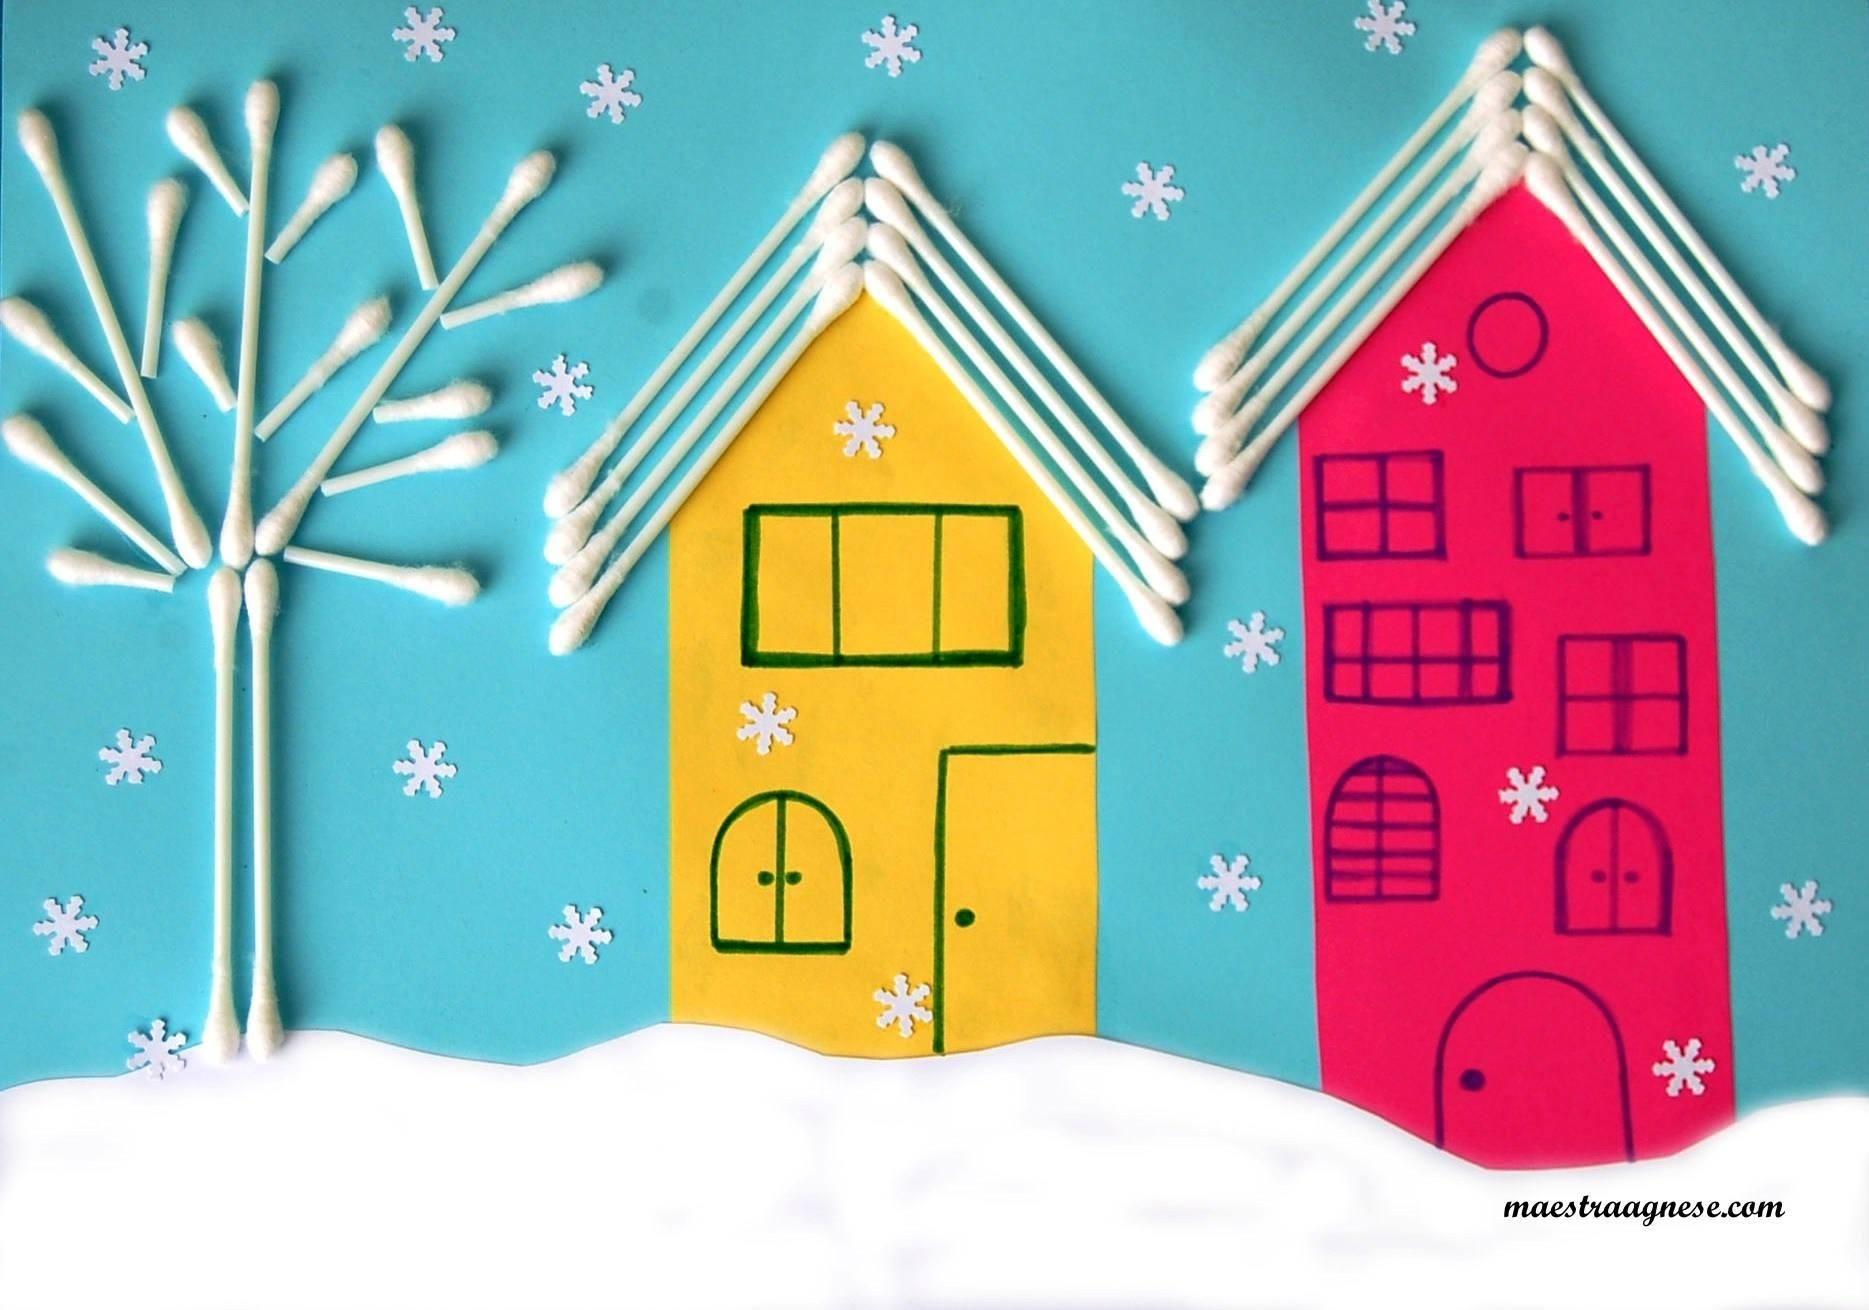 okul ncesi kulak temizleme ubuklar le k sanat etkinlikleri basteln winter. Black Bedroom Furniture Sets. Home Design Ideas